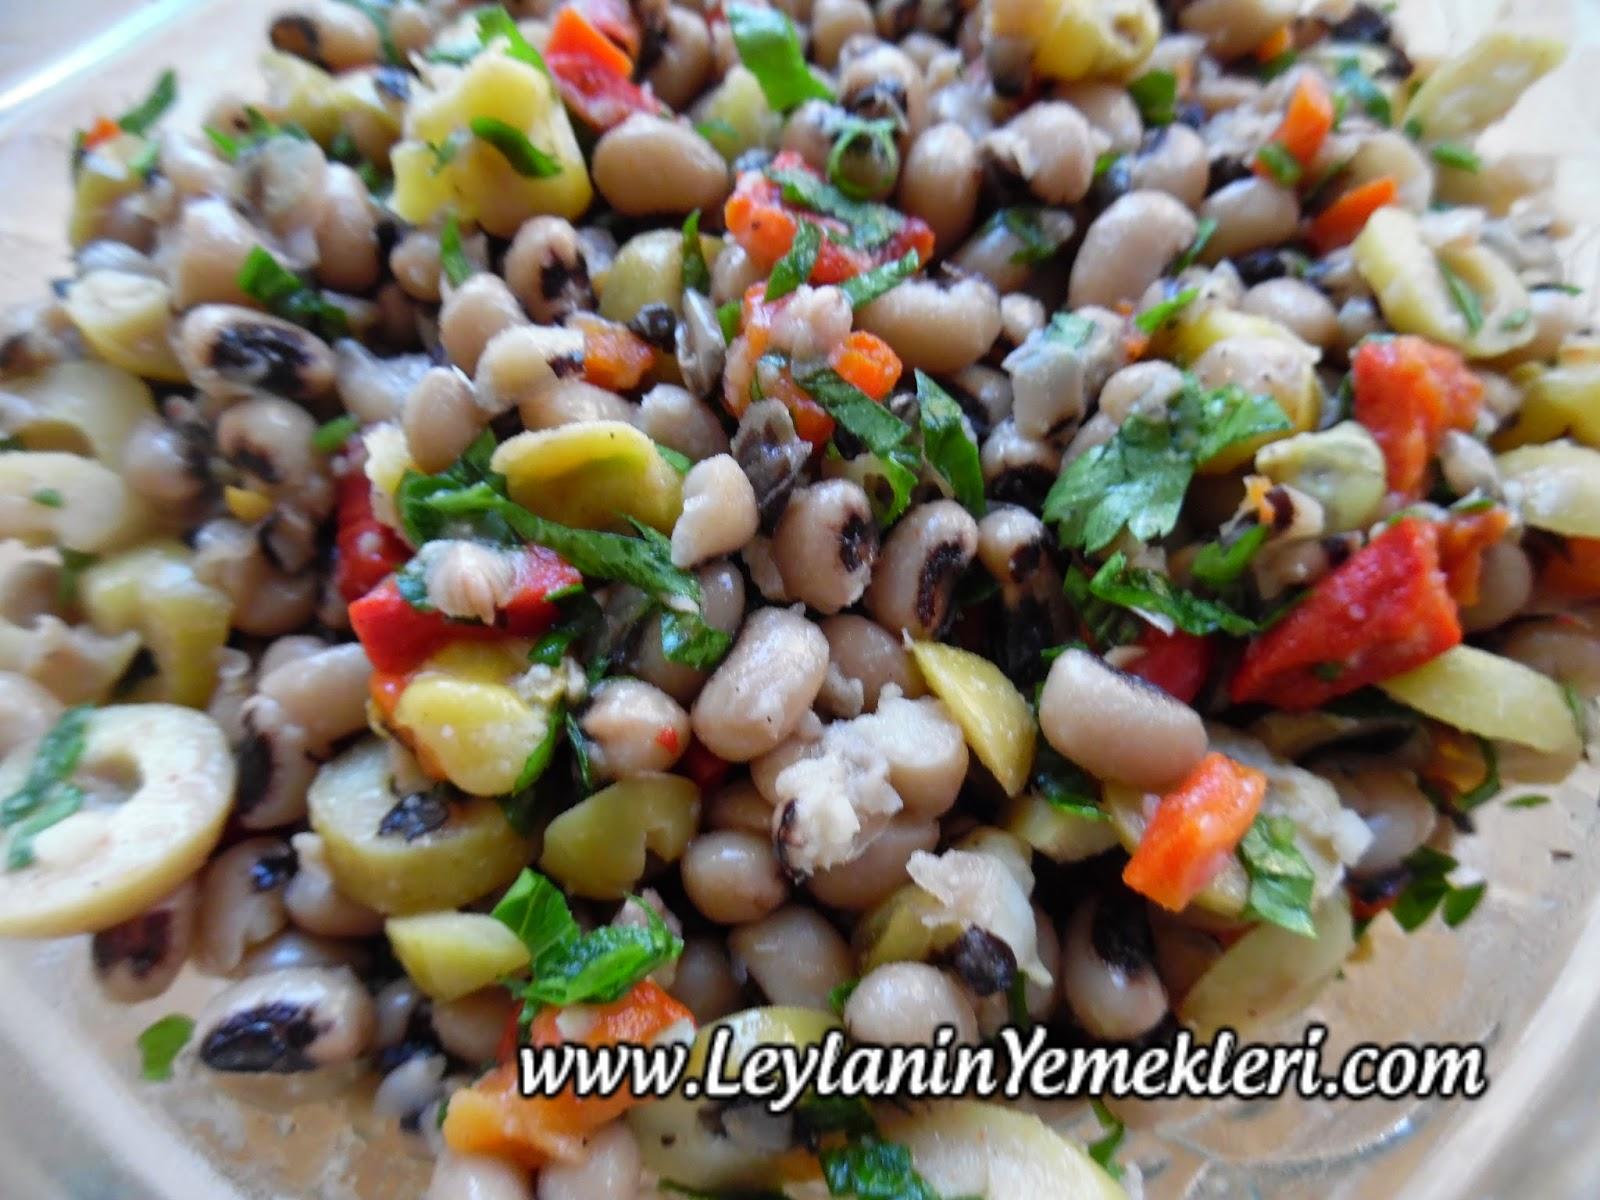 Kuru Börülce Salatası Tarifi – Salata Tarifleri